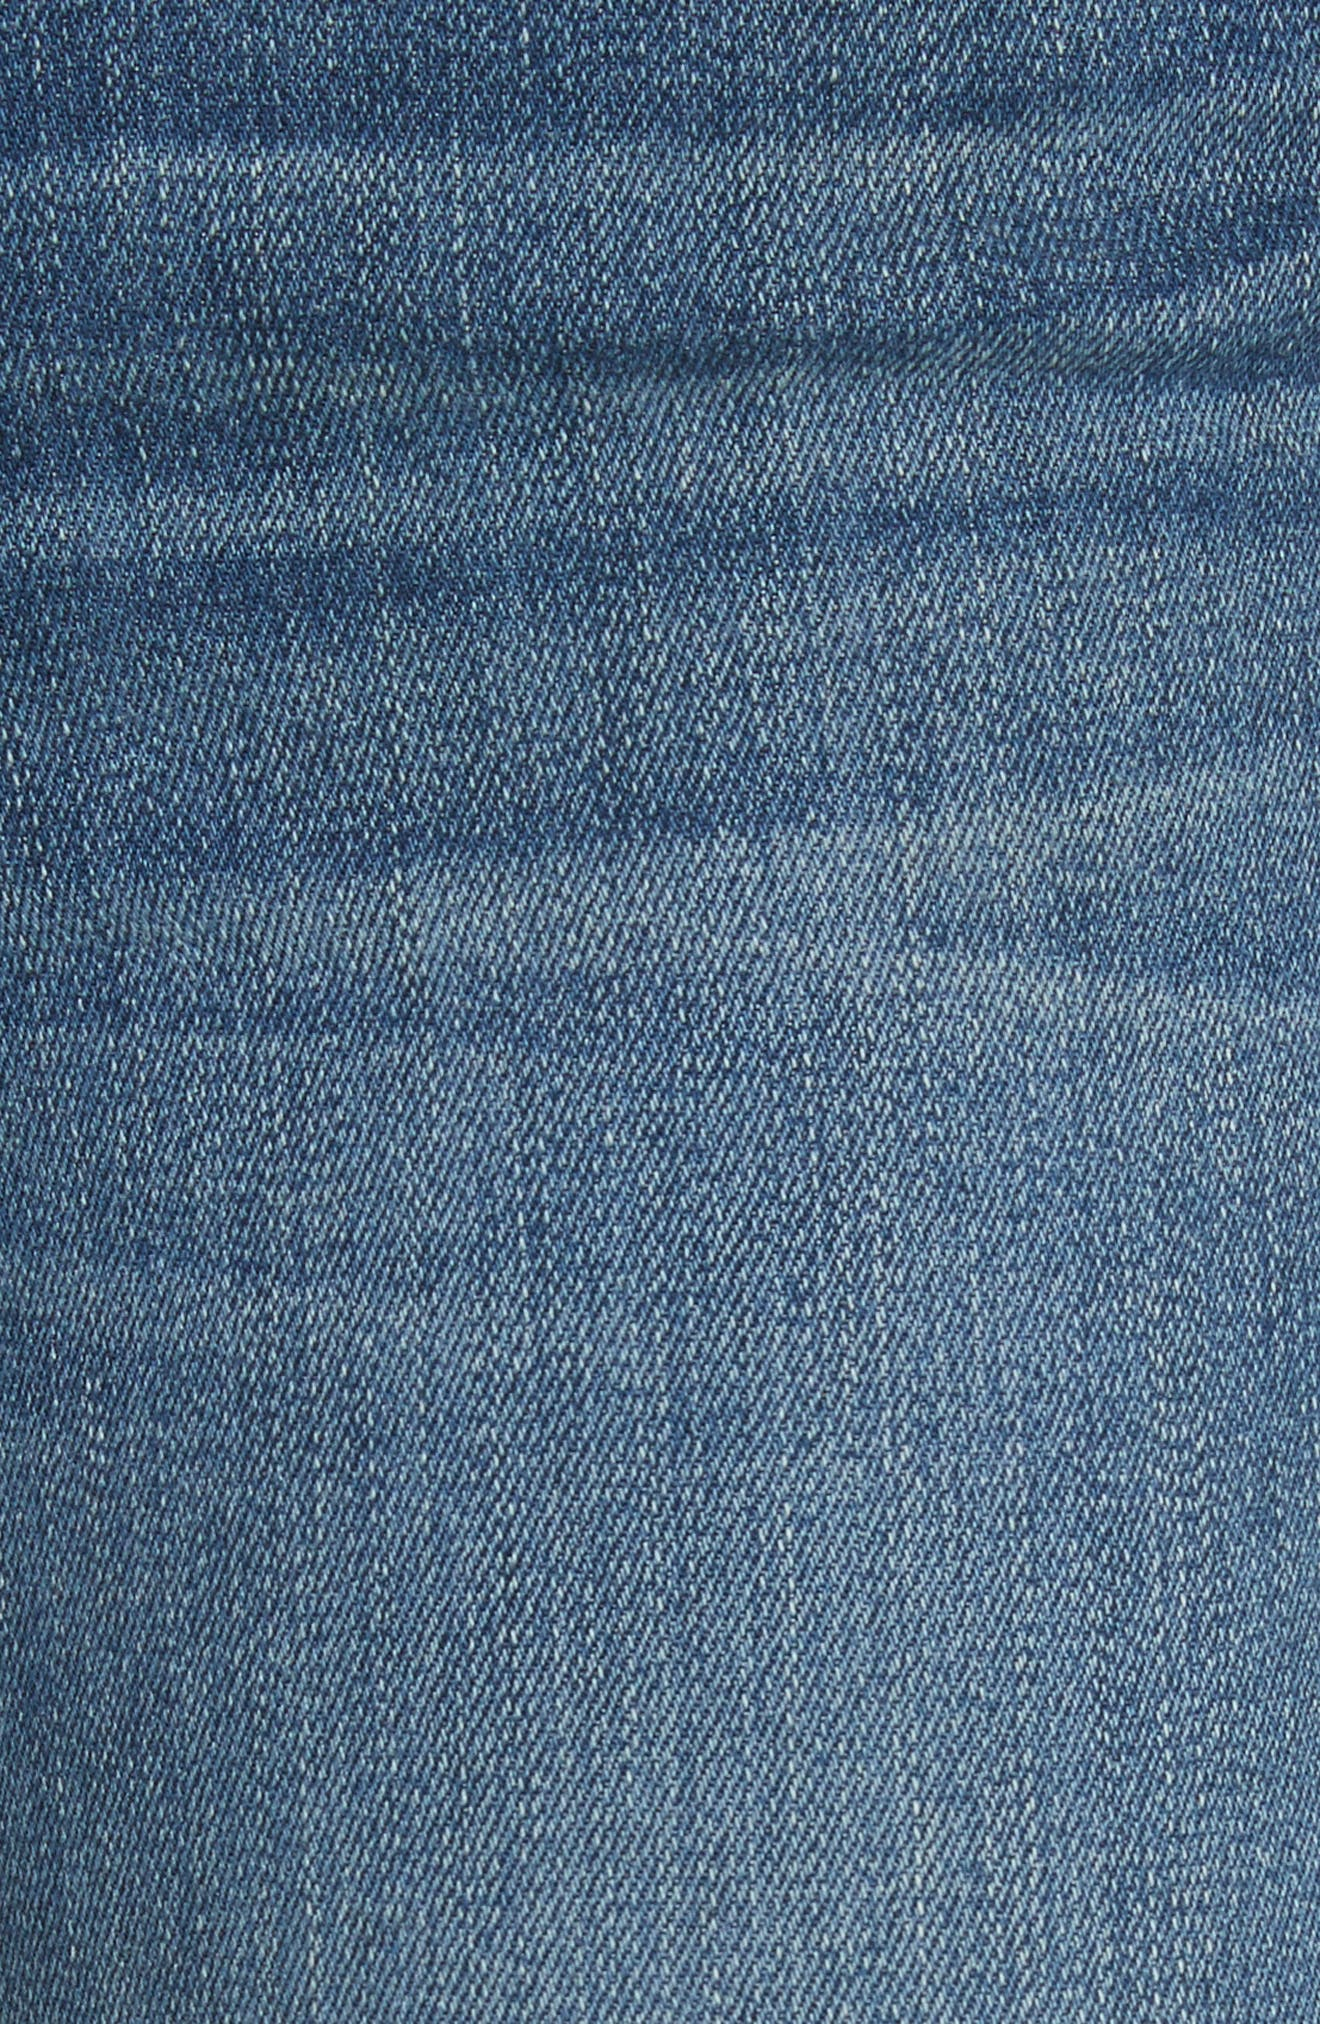 W4 Abigail Released Split Hem Ankle Skinny Jeans,                             Alternate thumbnail 5, color,                             427